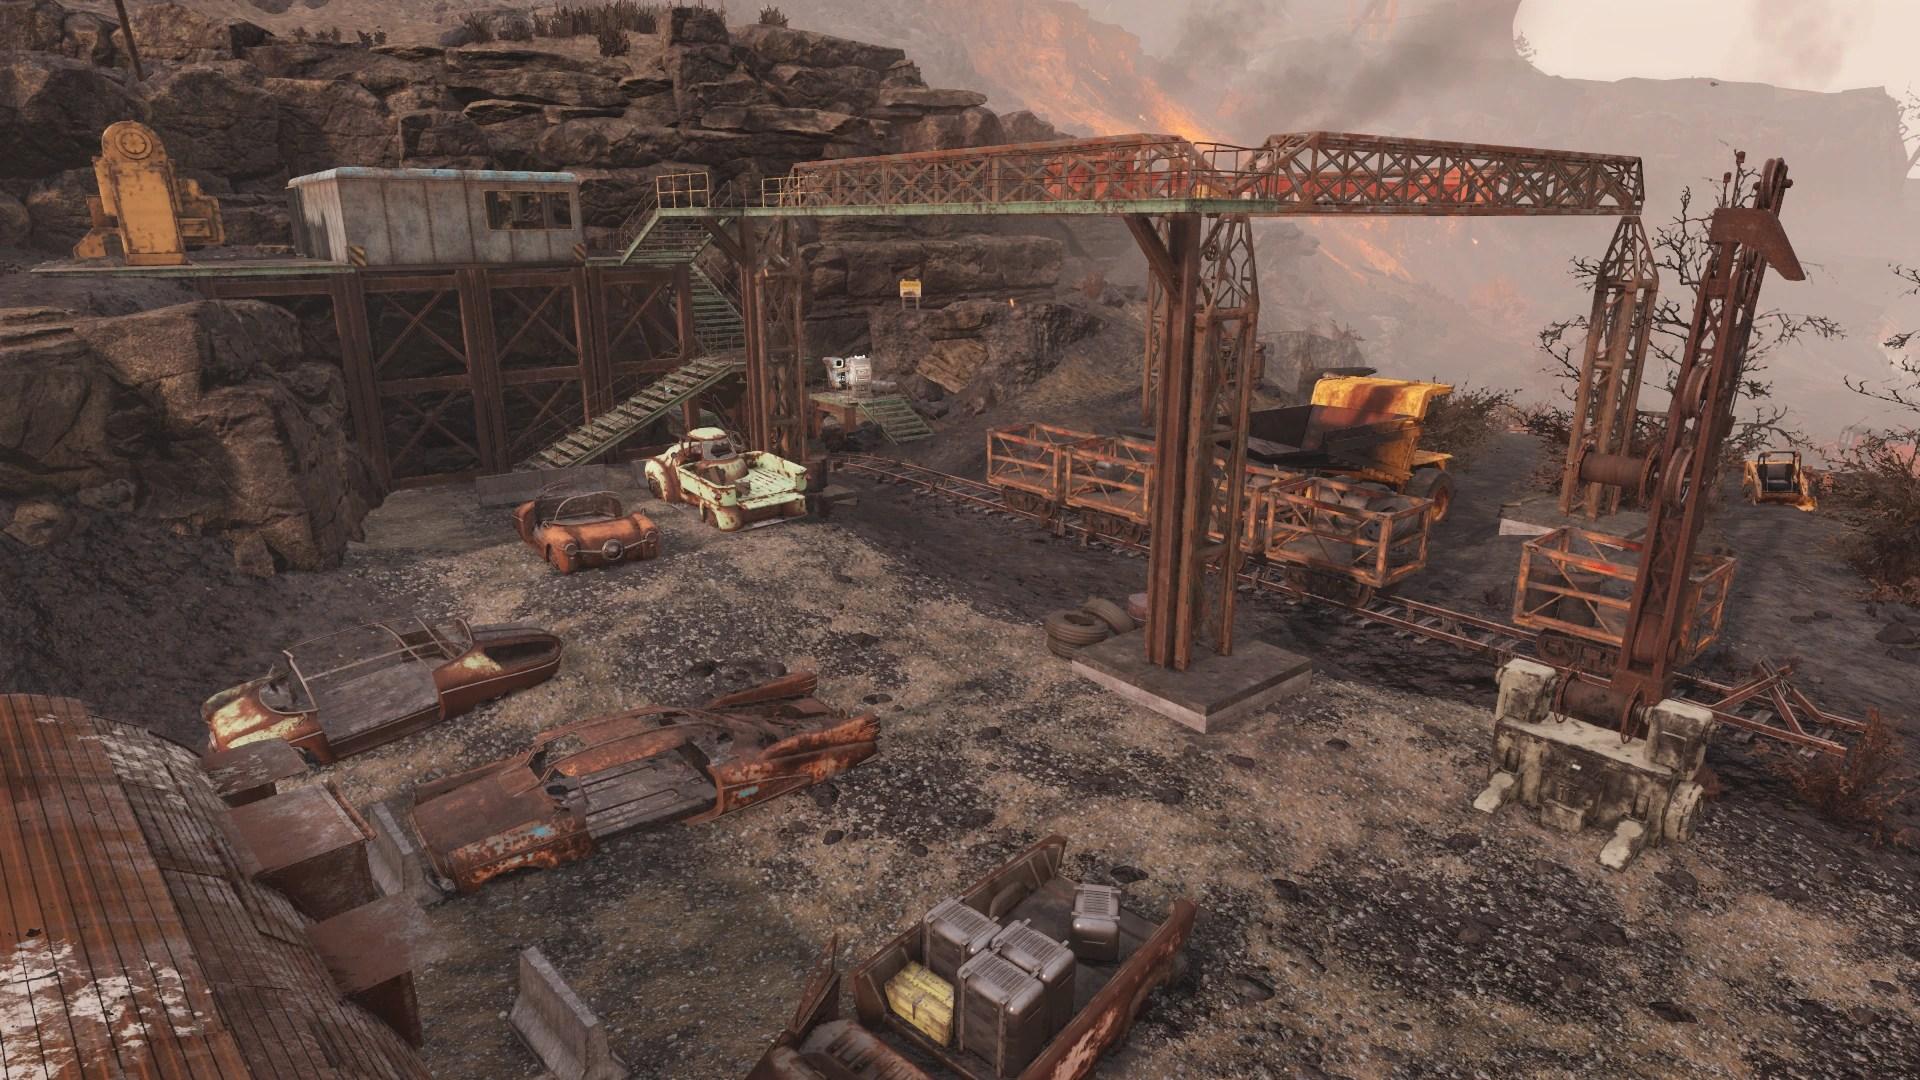 Abandoned Mine Site Kittery Fallout Wiki FANDOM Powered By Wikia